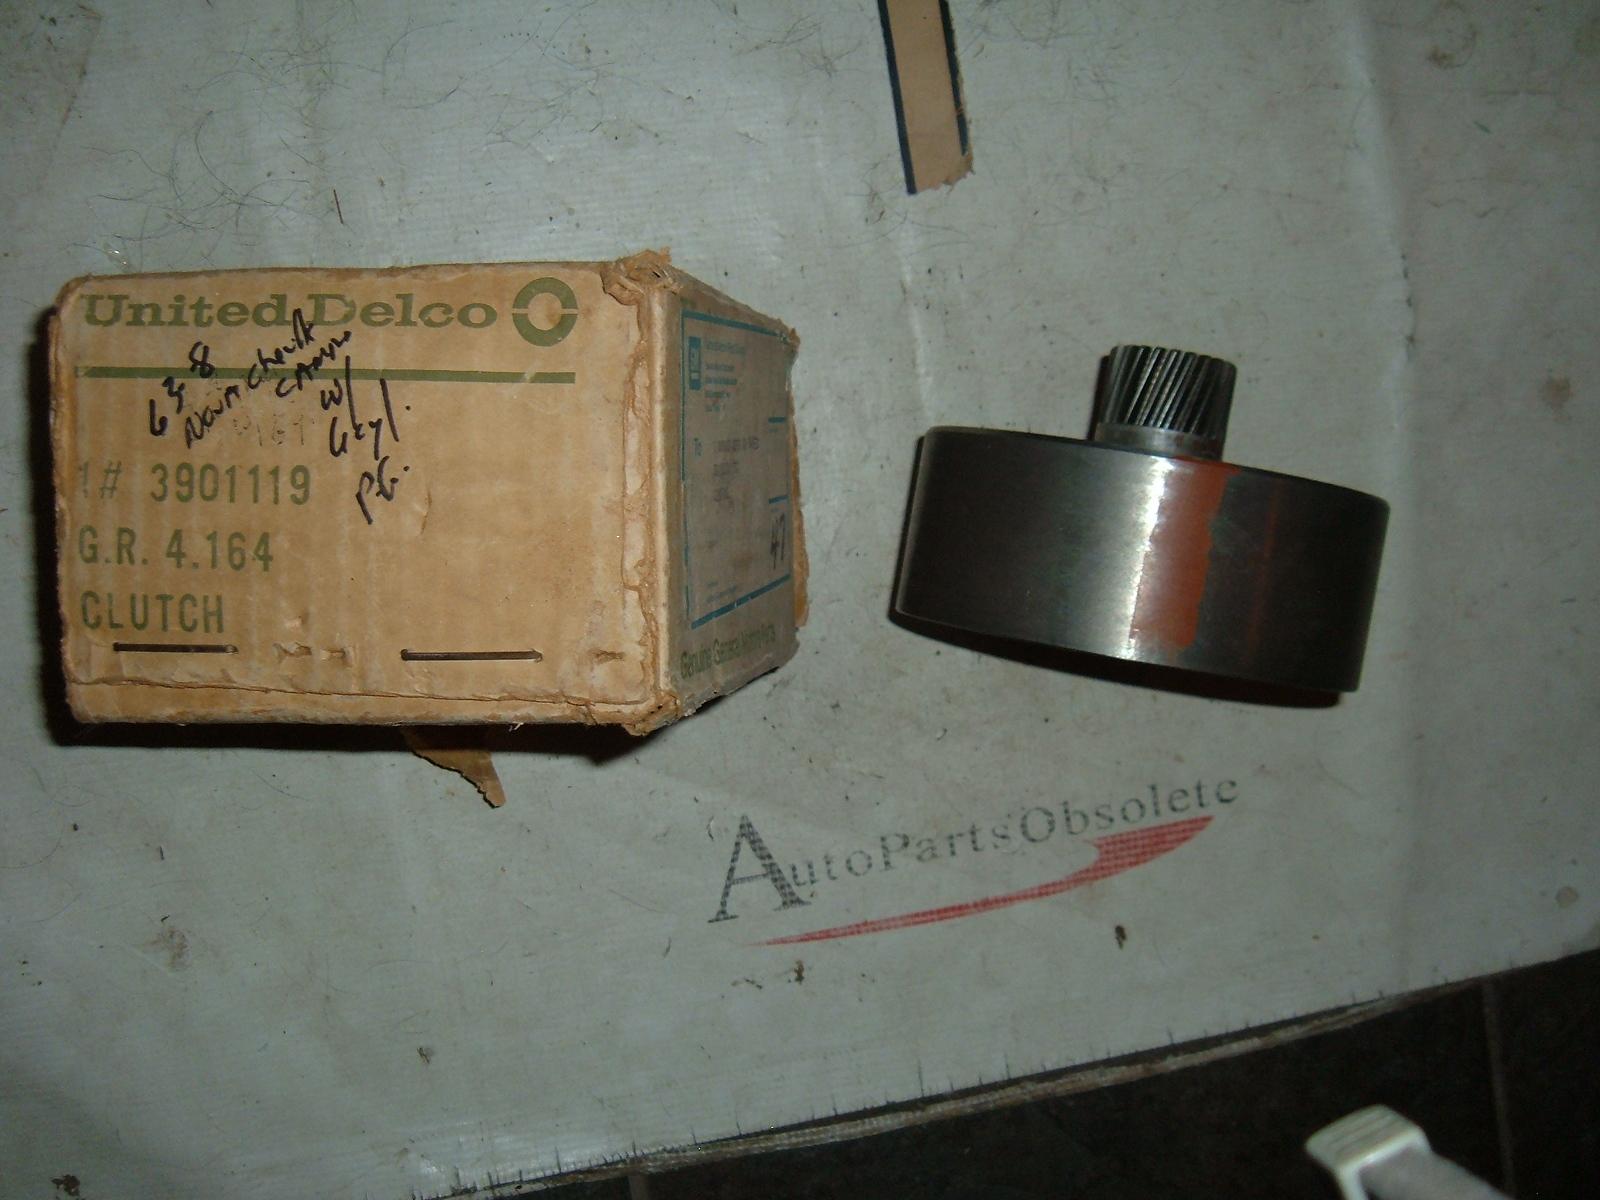 View Product1963 64 65 66 67 68 chevrolet nova chevelle powerglide transmission clutch nos gm # 3901119 (z 3901119)